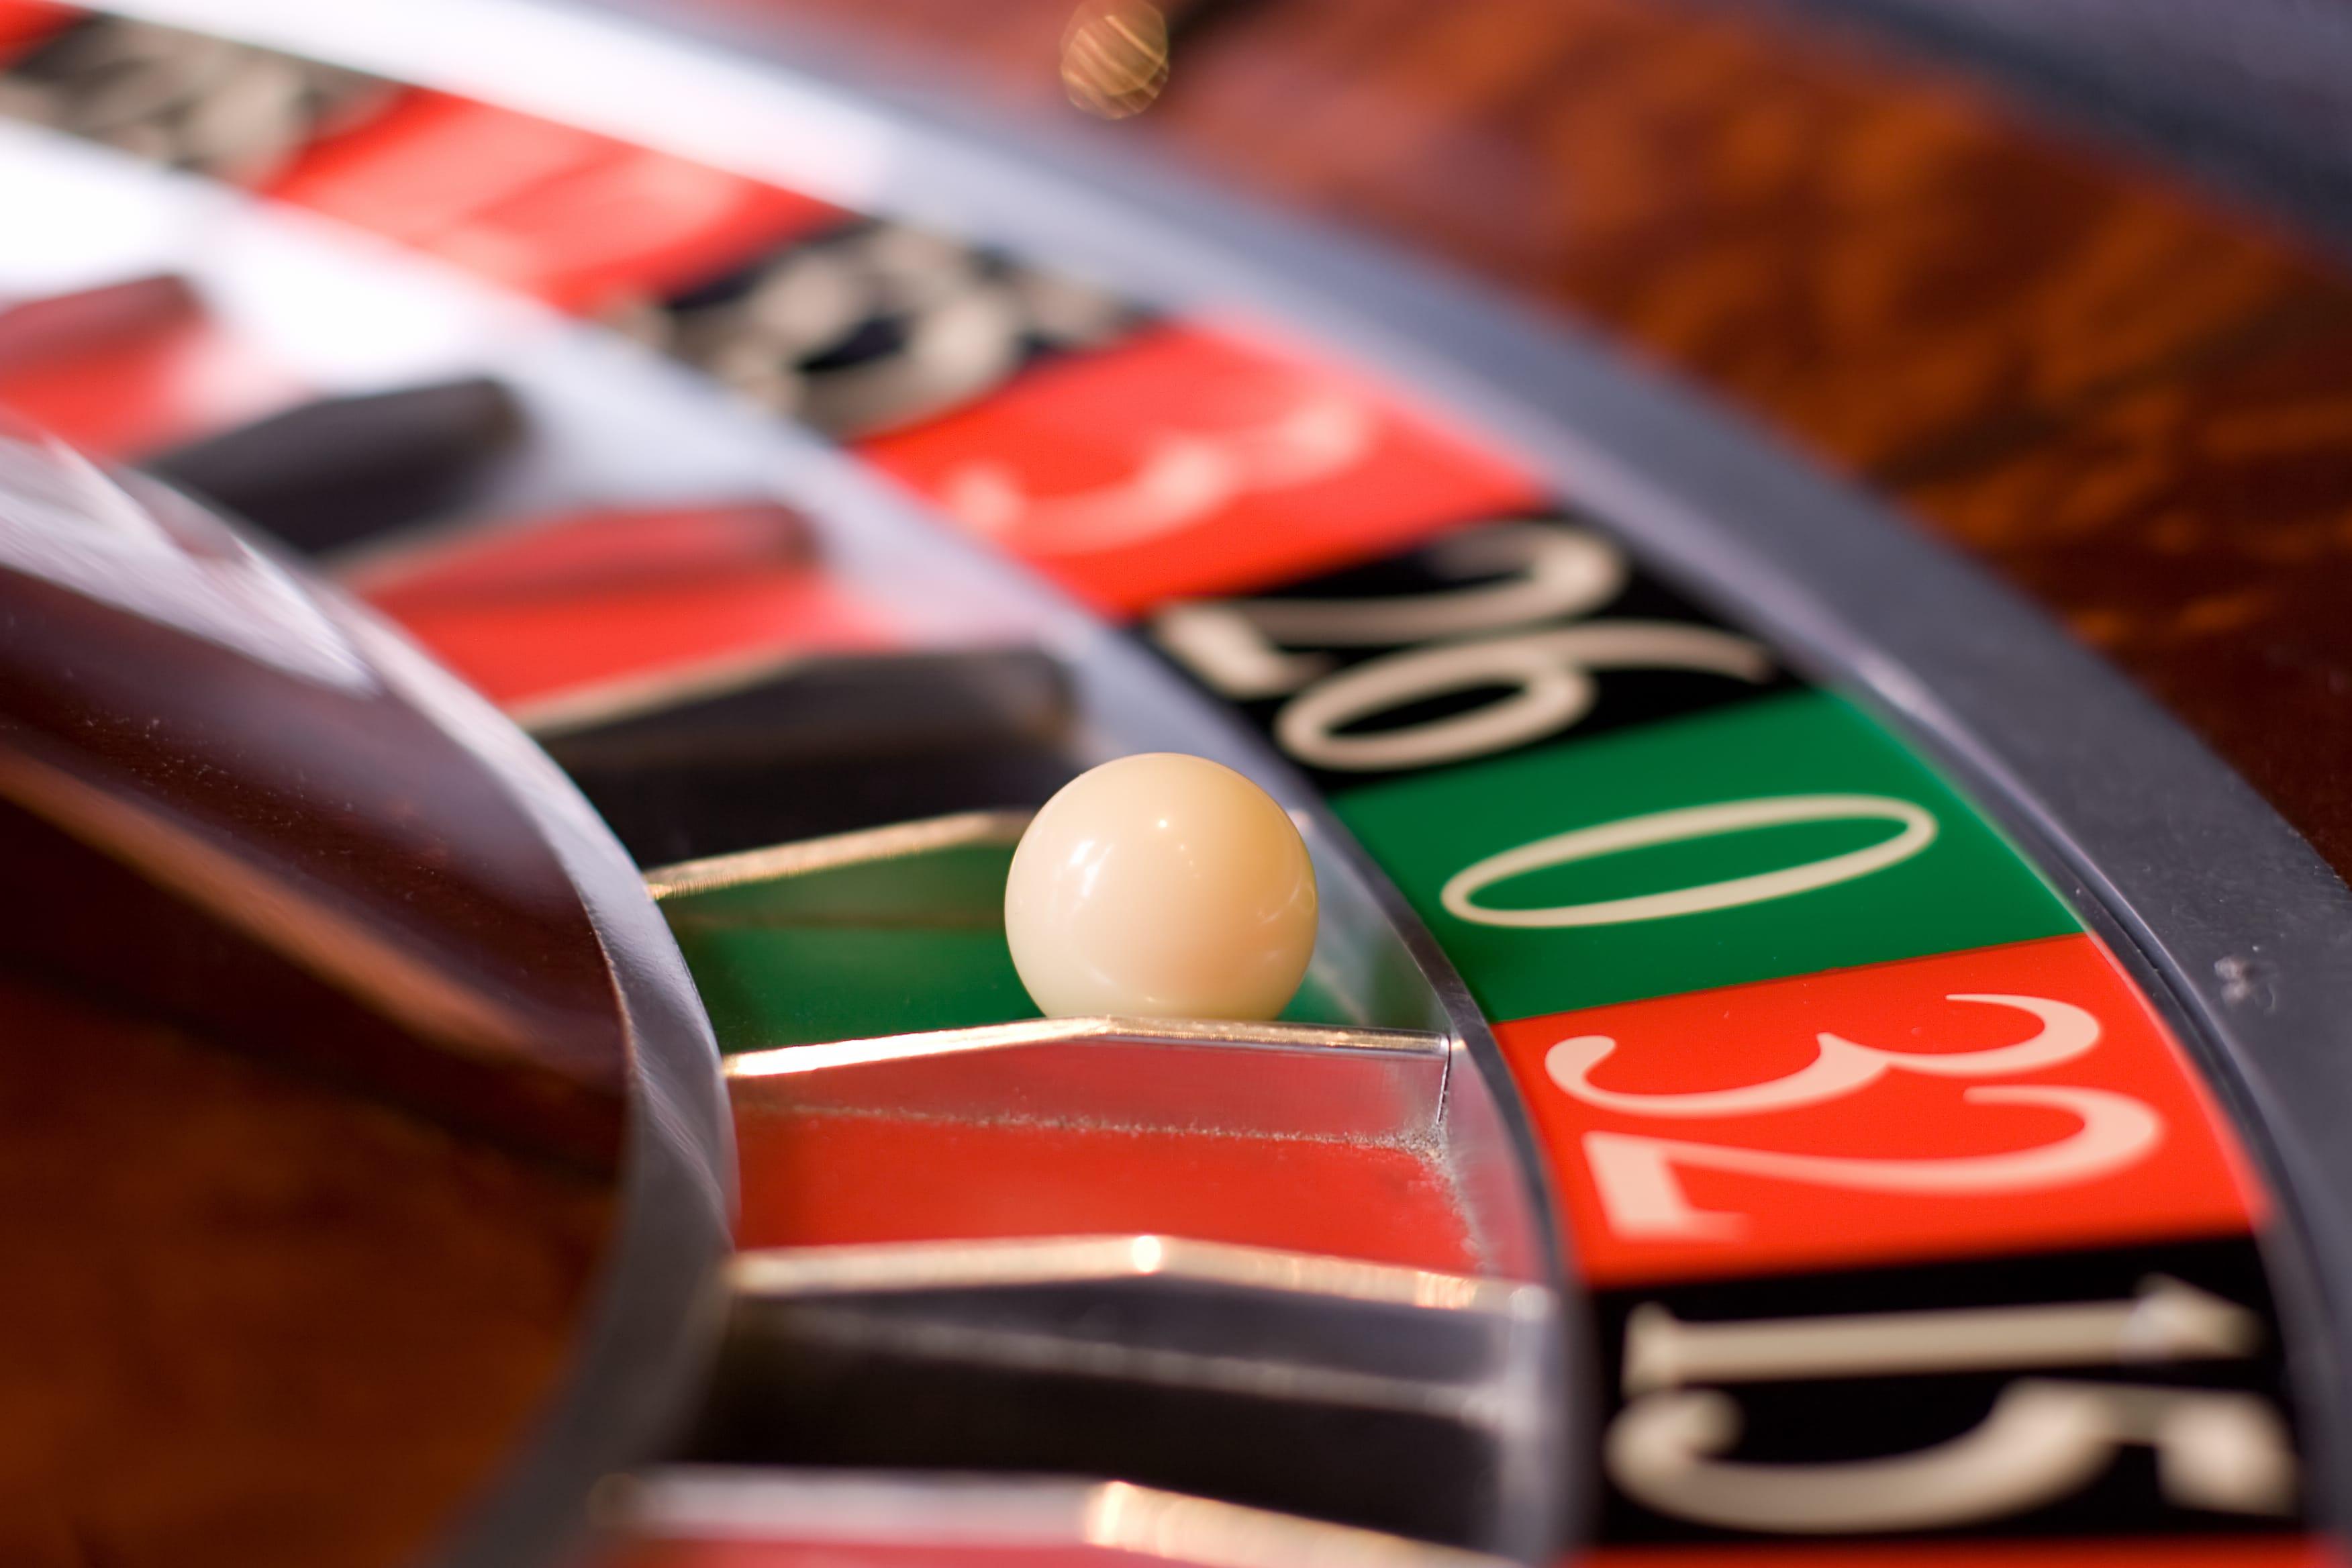 Skycity gambling